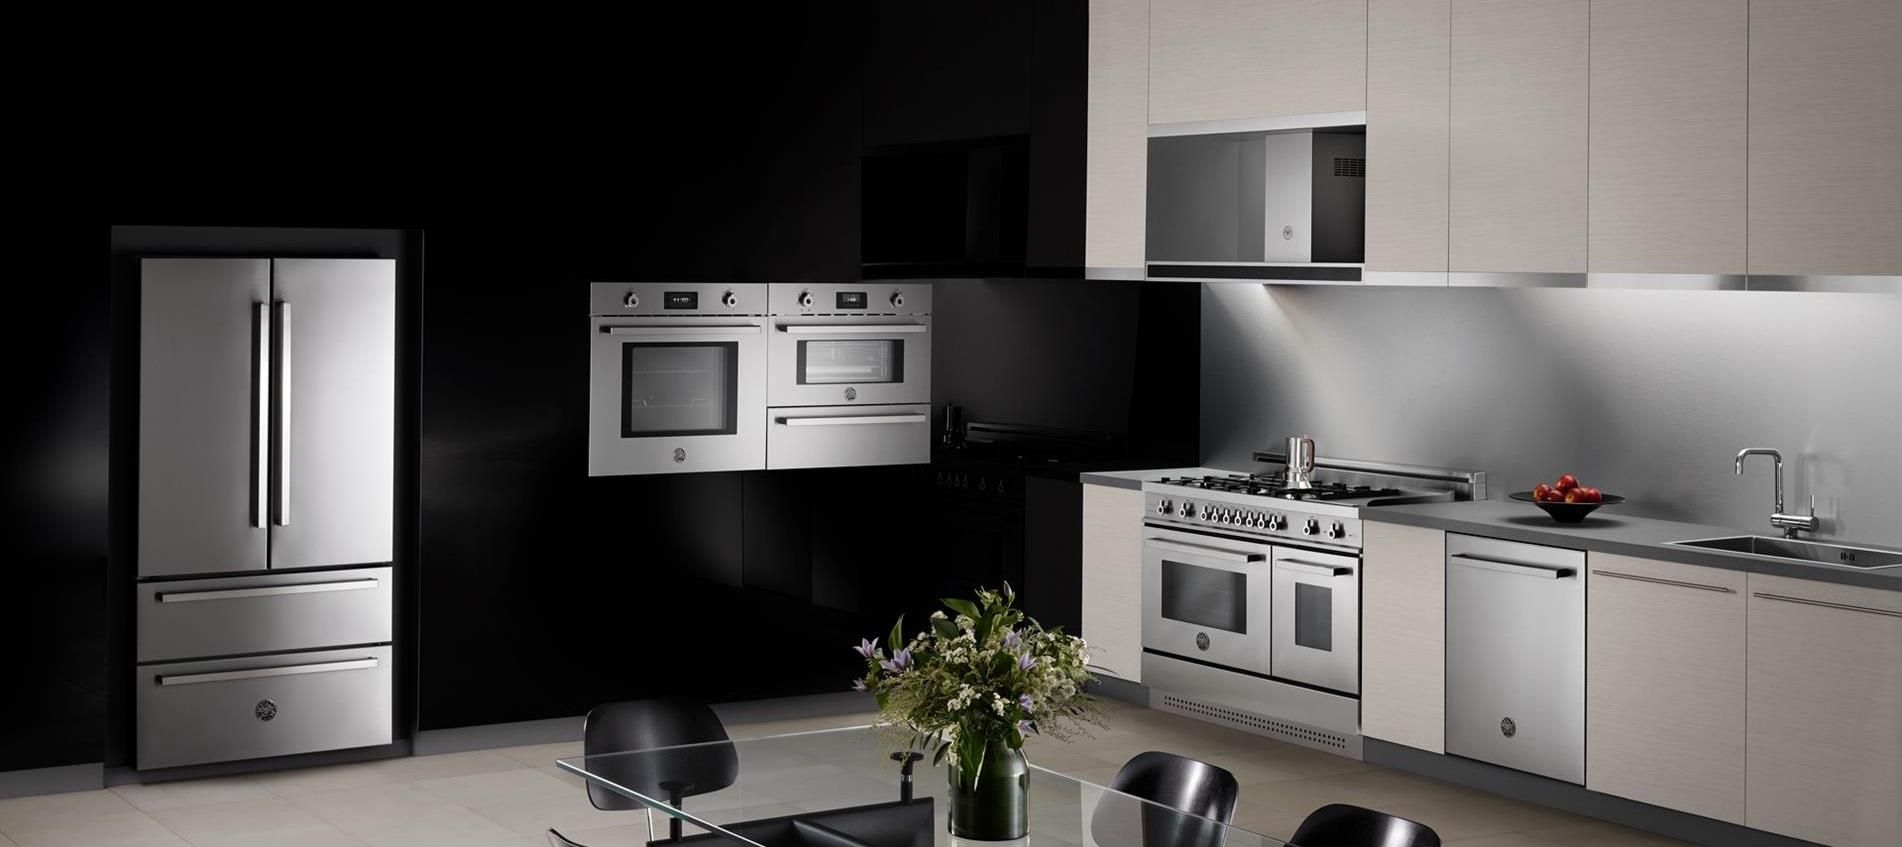 Refrigerador de piso e de embutir Bertazzoni PRO REF90.